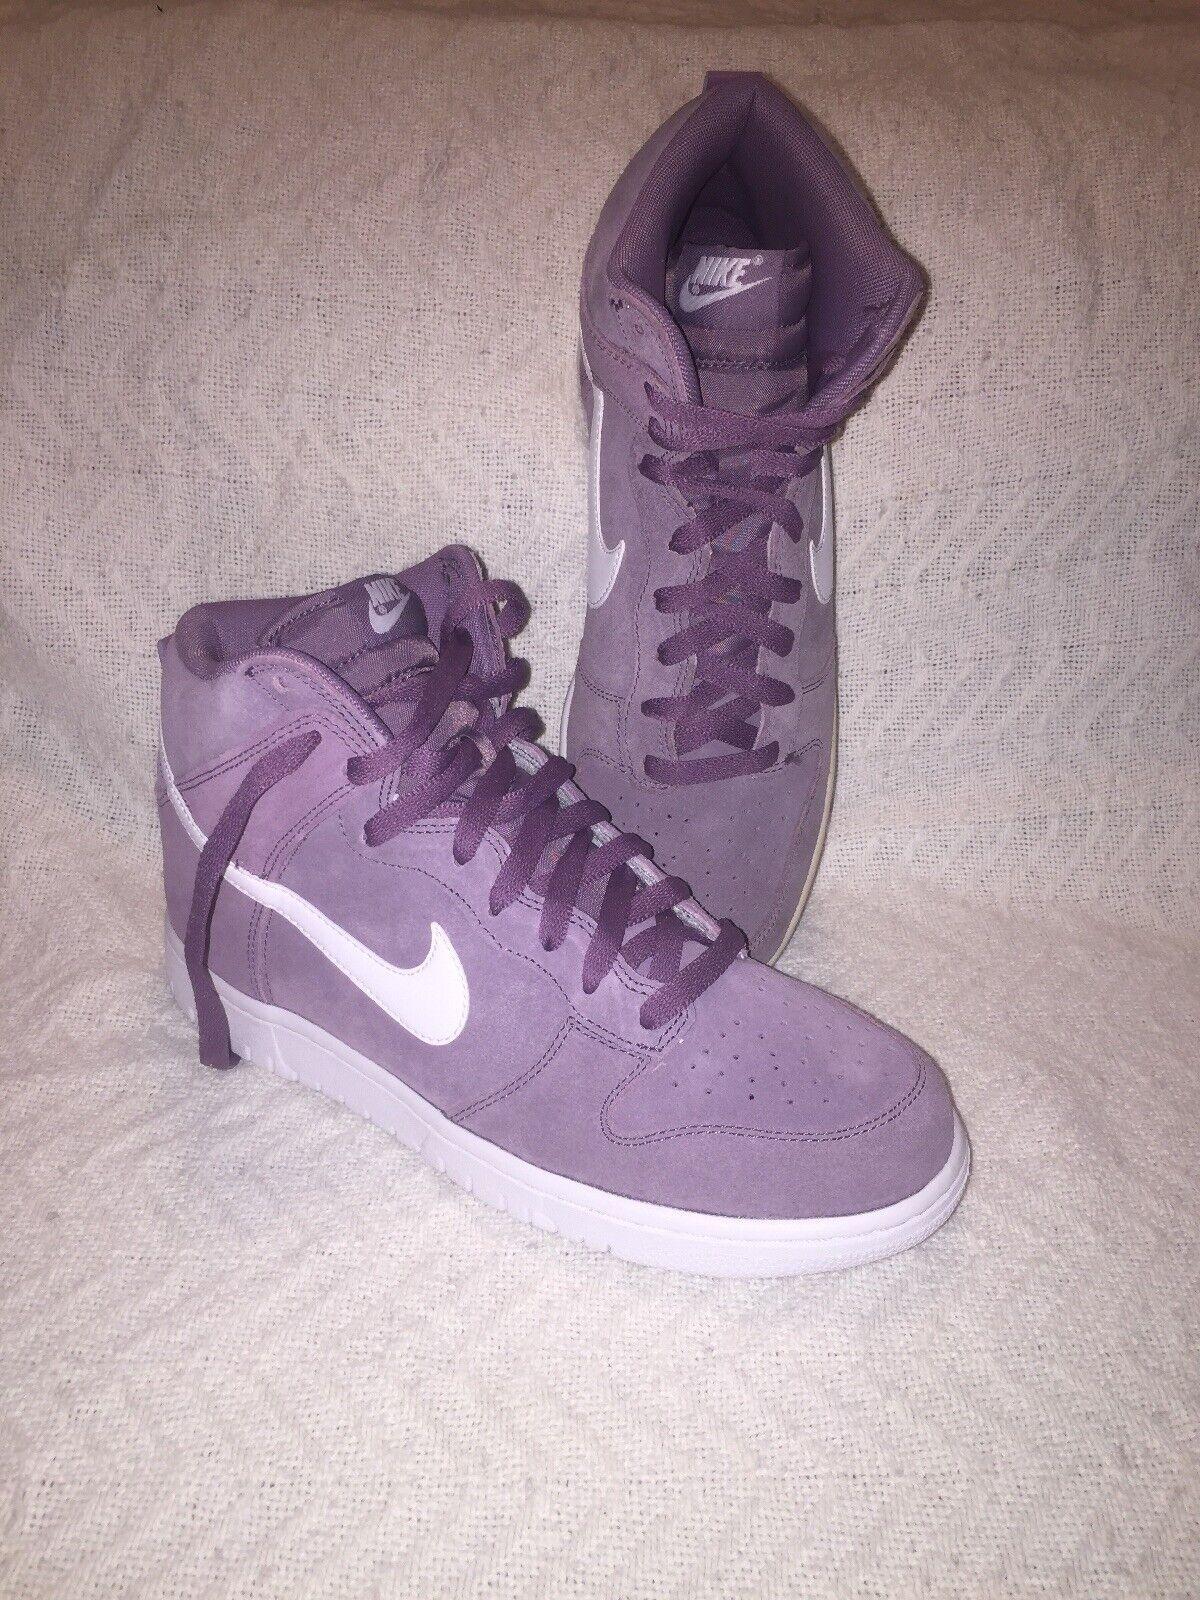 Nike Dunk Hi purple Dust White Poussiere VLT white size 9